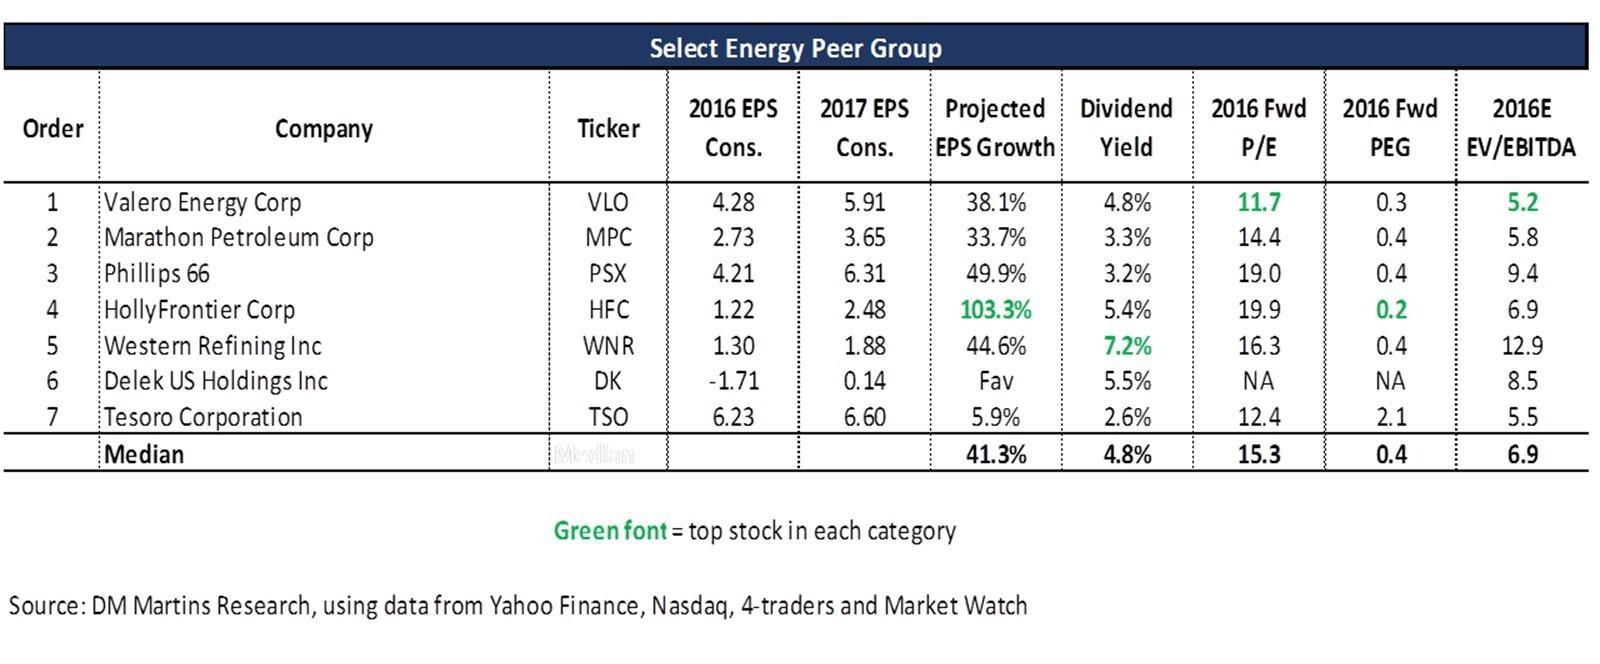 Vlo Stock Quote Valero  Battered Stock Presents An Opportunity  Valero Energy